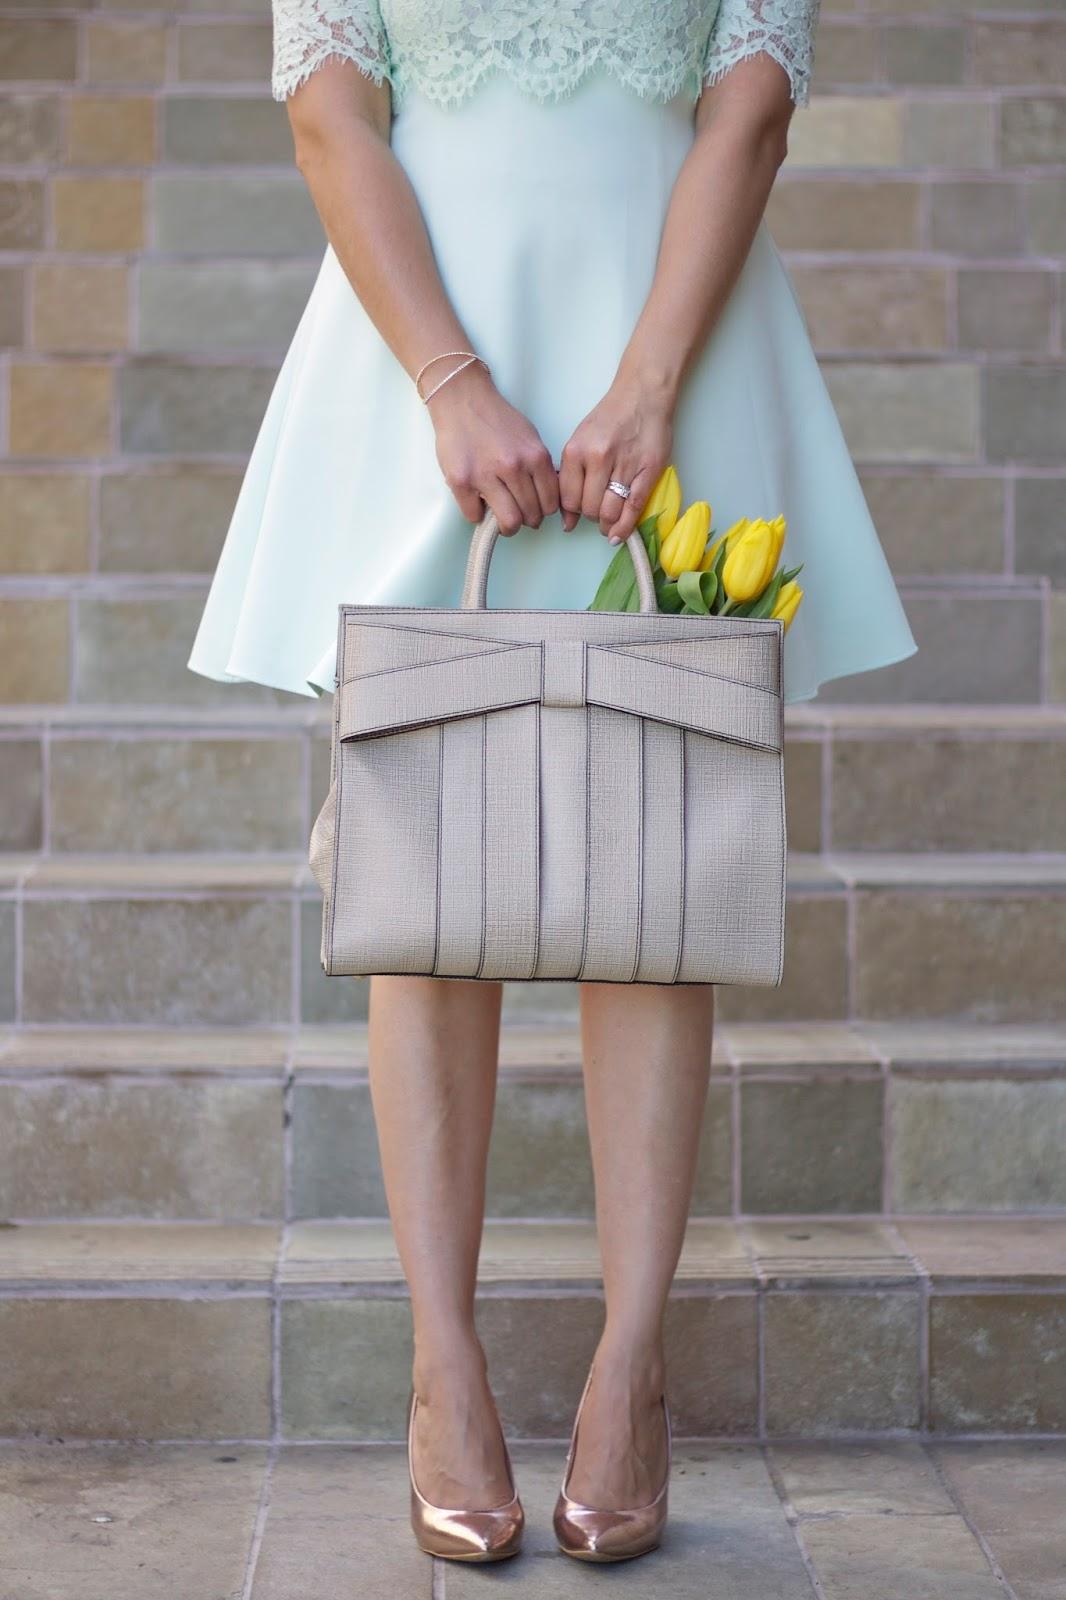 Pinterest worthy picture, bow handbag, Pretty pictures, elegant attire